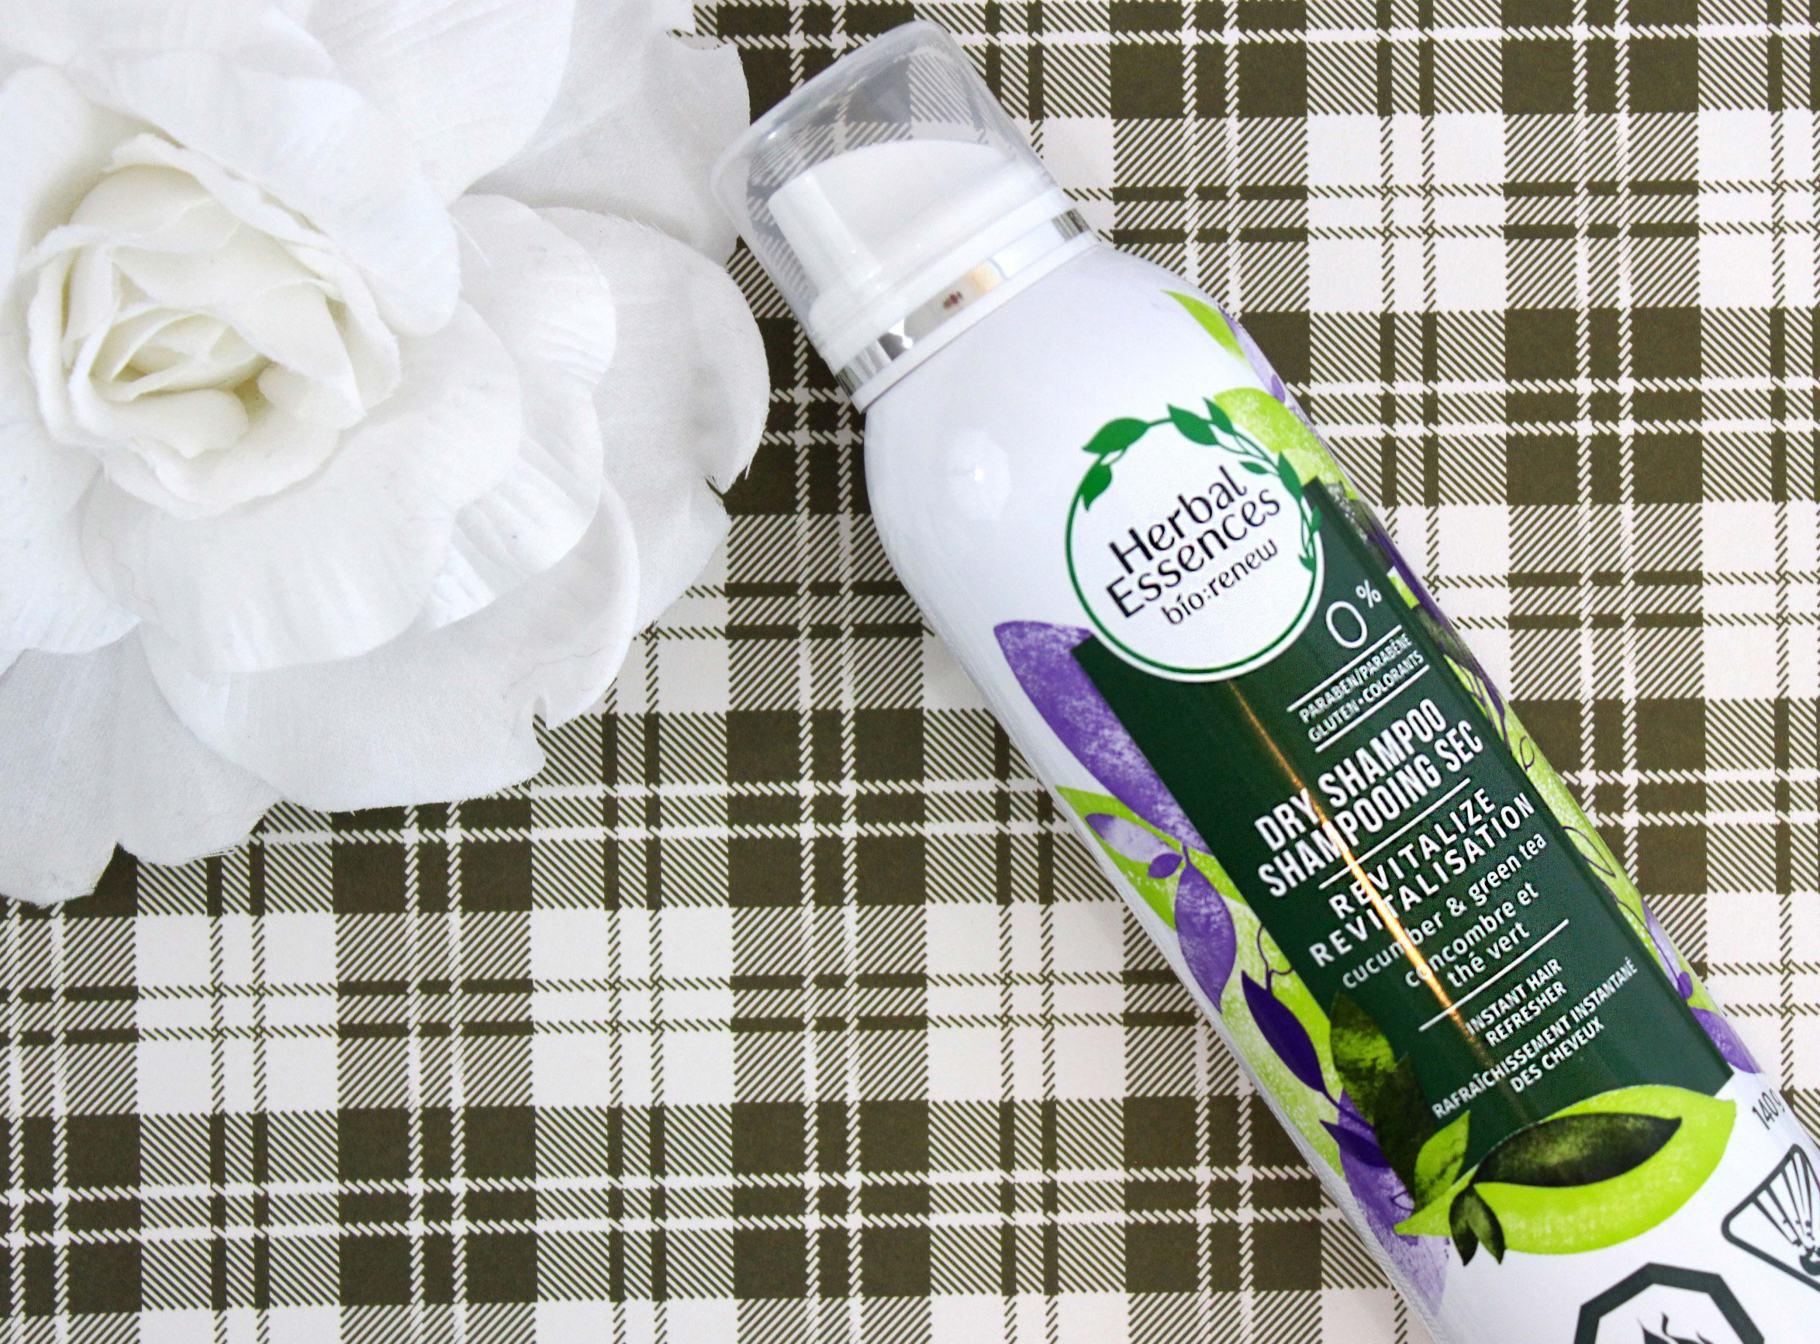 Herbal Essences Bio:Renew Dry Shampoo | Review